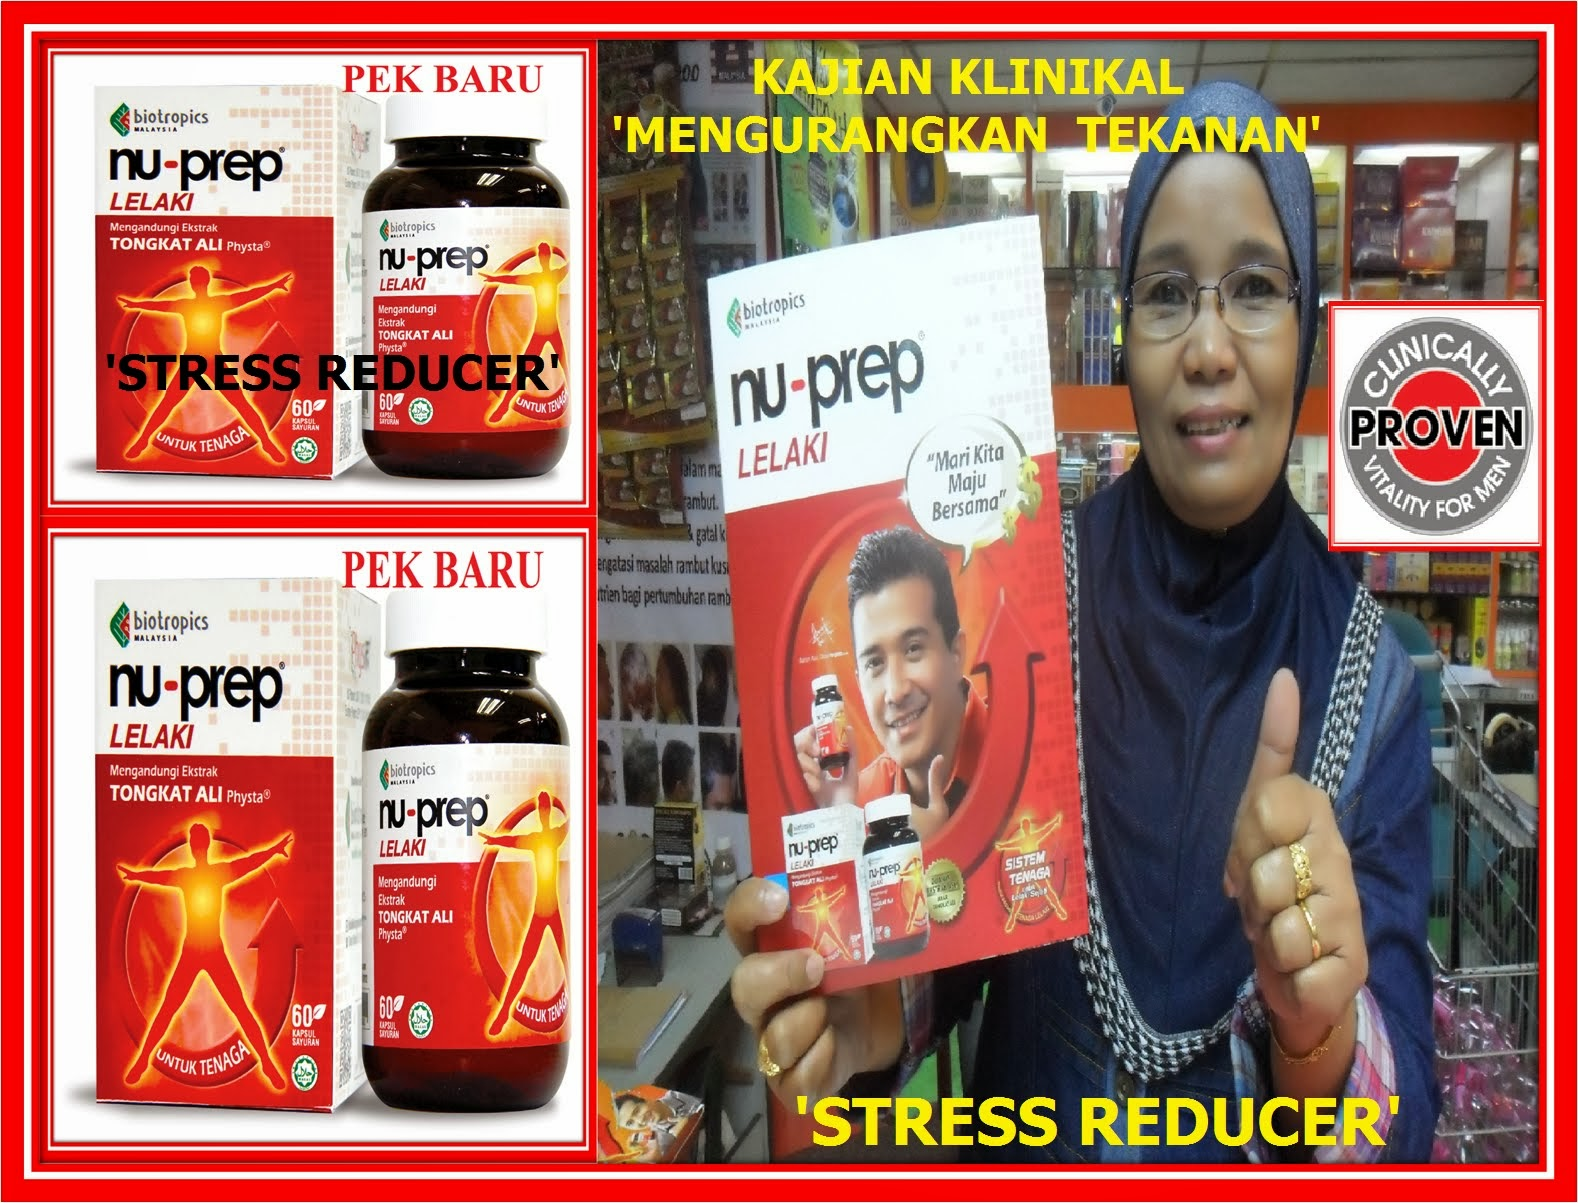 Kajian Klinikal Bukti Untuk Pengguna Bijak 'Clinically proven ' STRESS REDUCER'